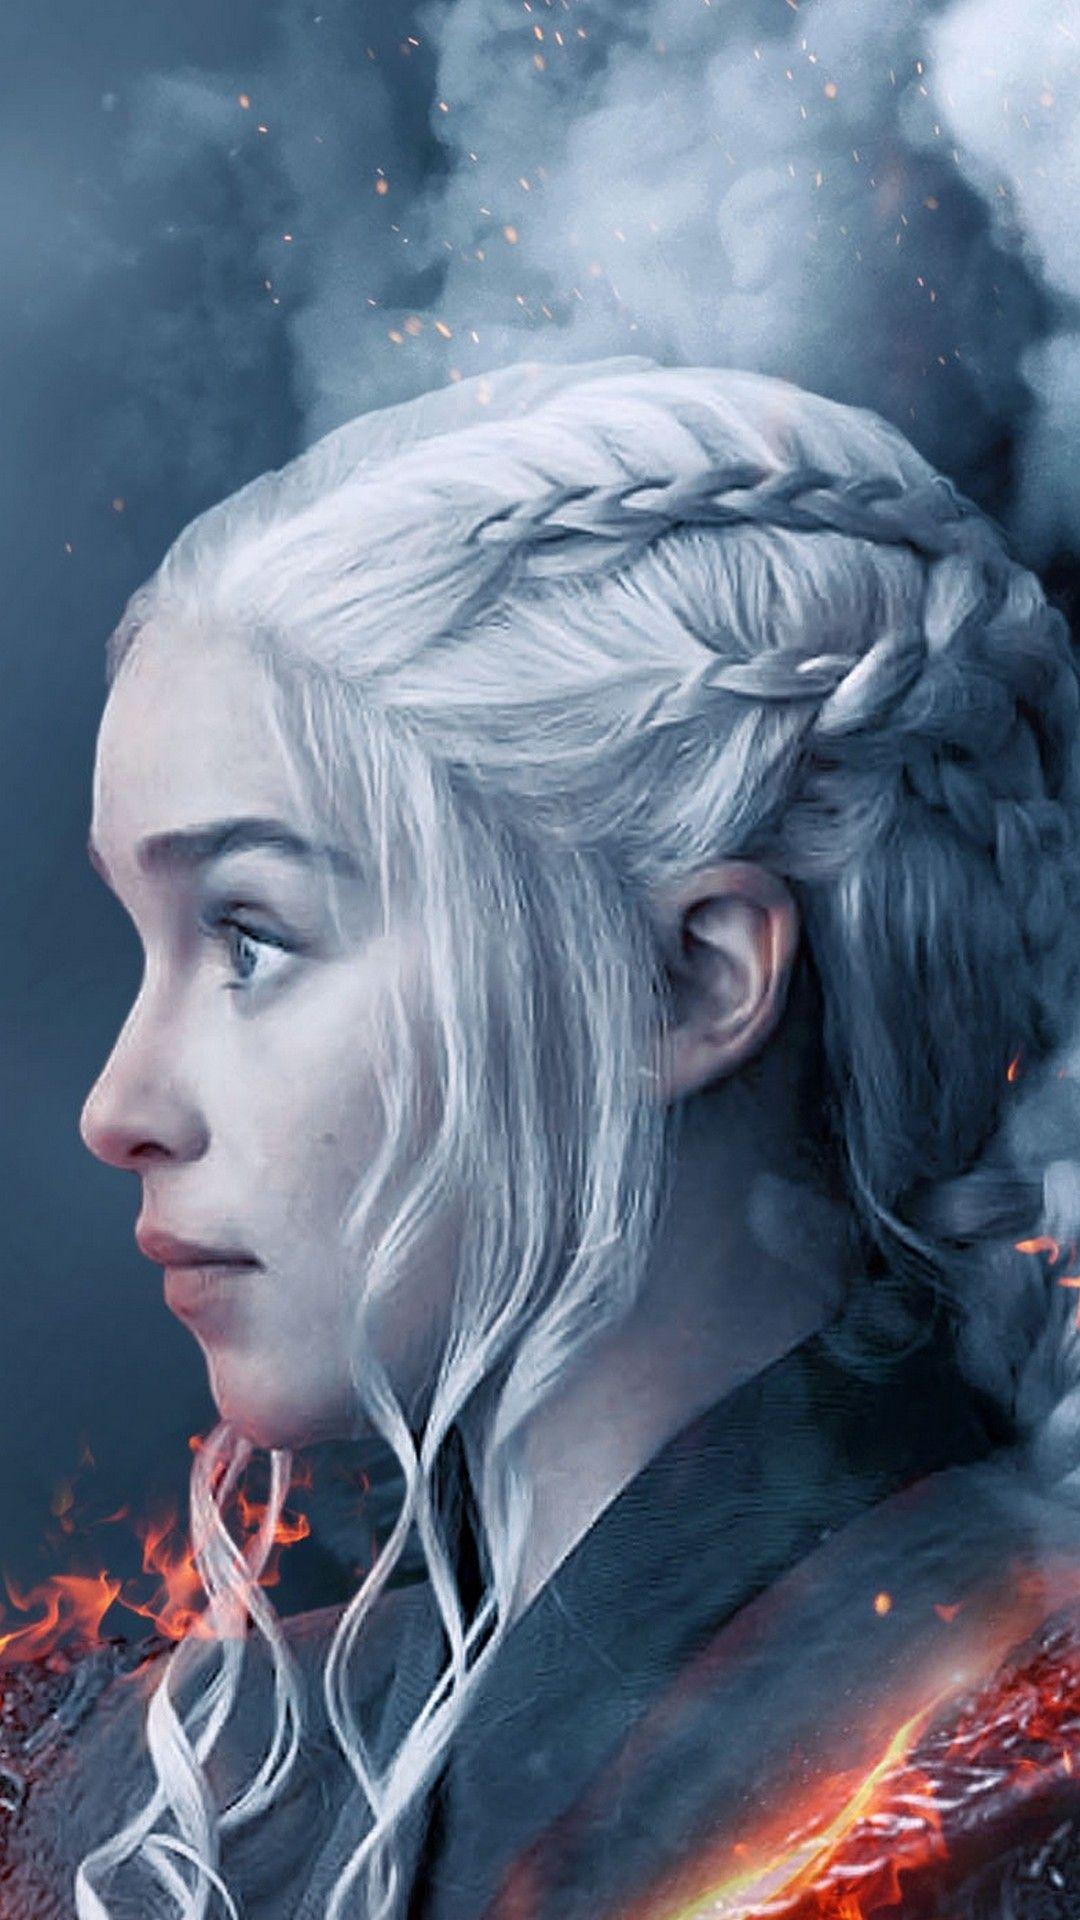 Game of Thrones 8 Season iPhone 6 Wallpaper Iphone 6